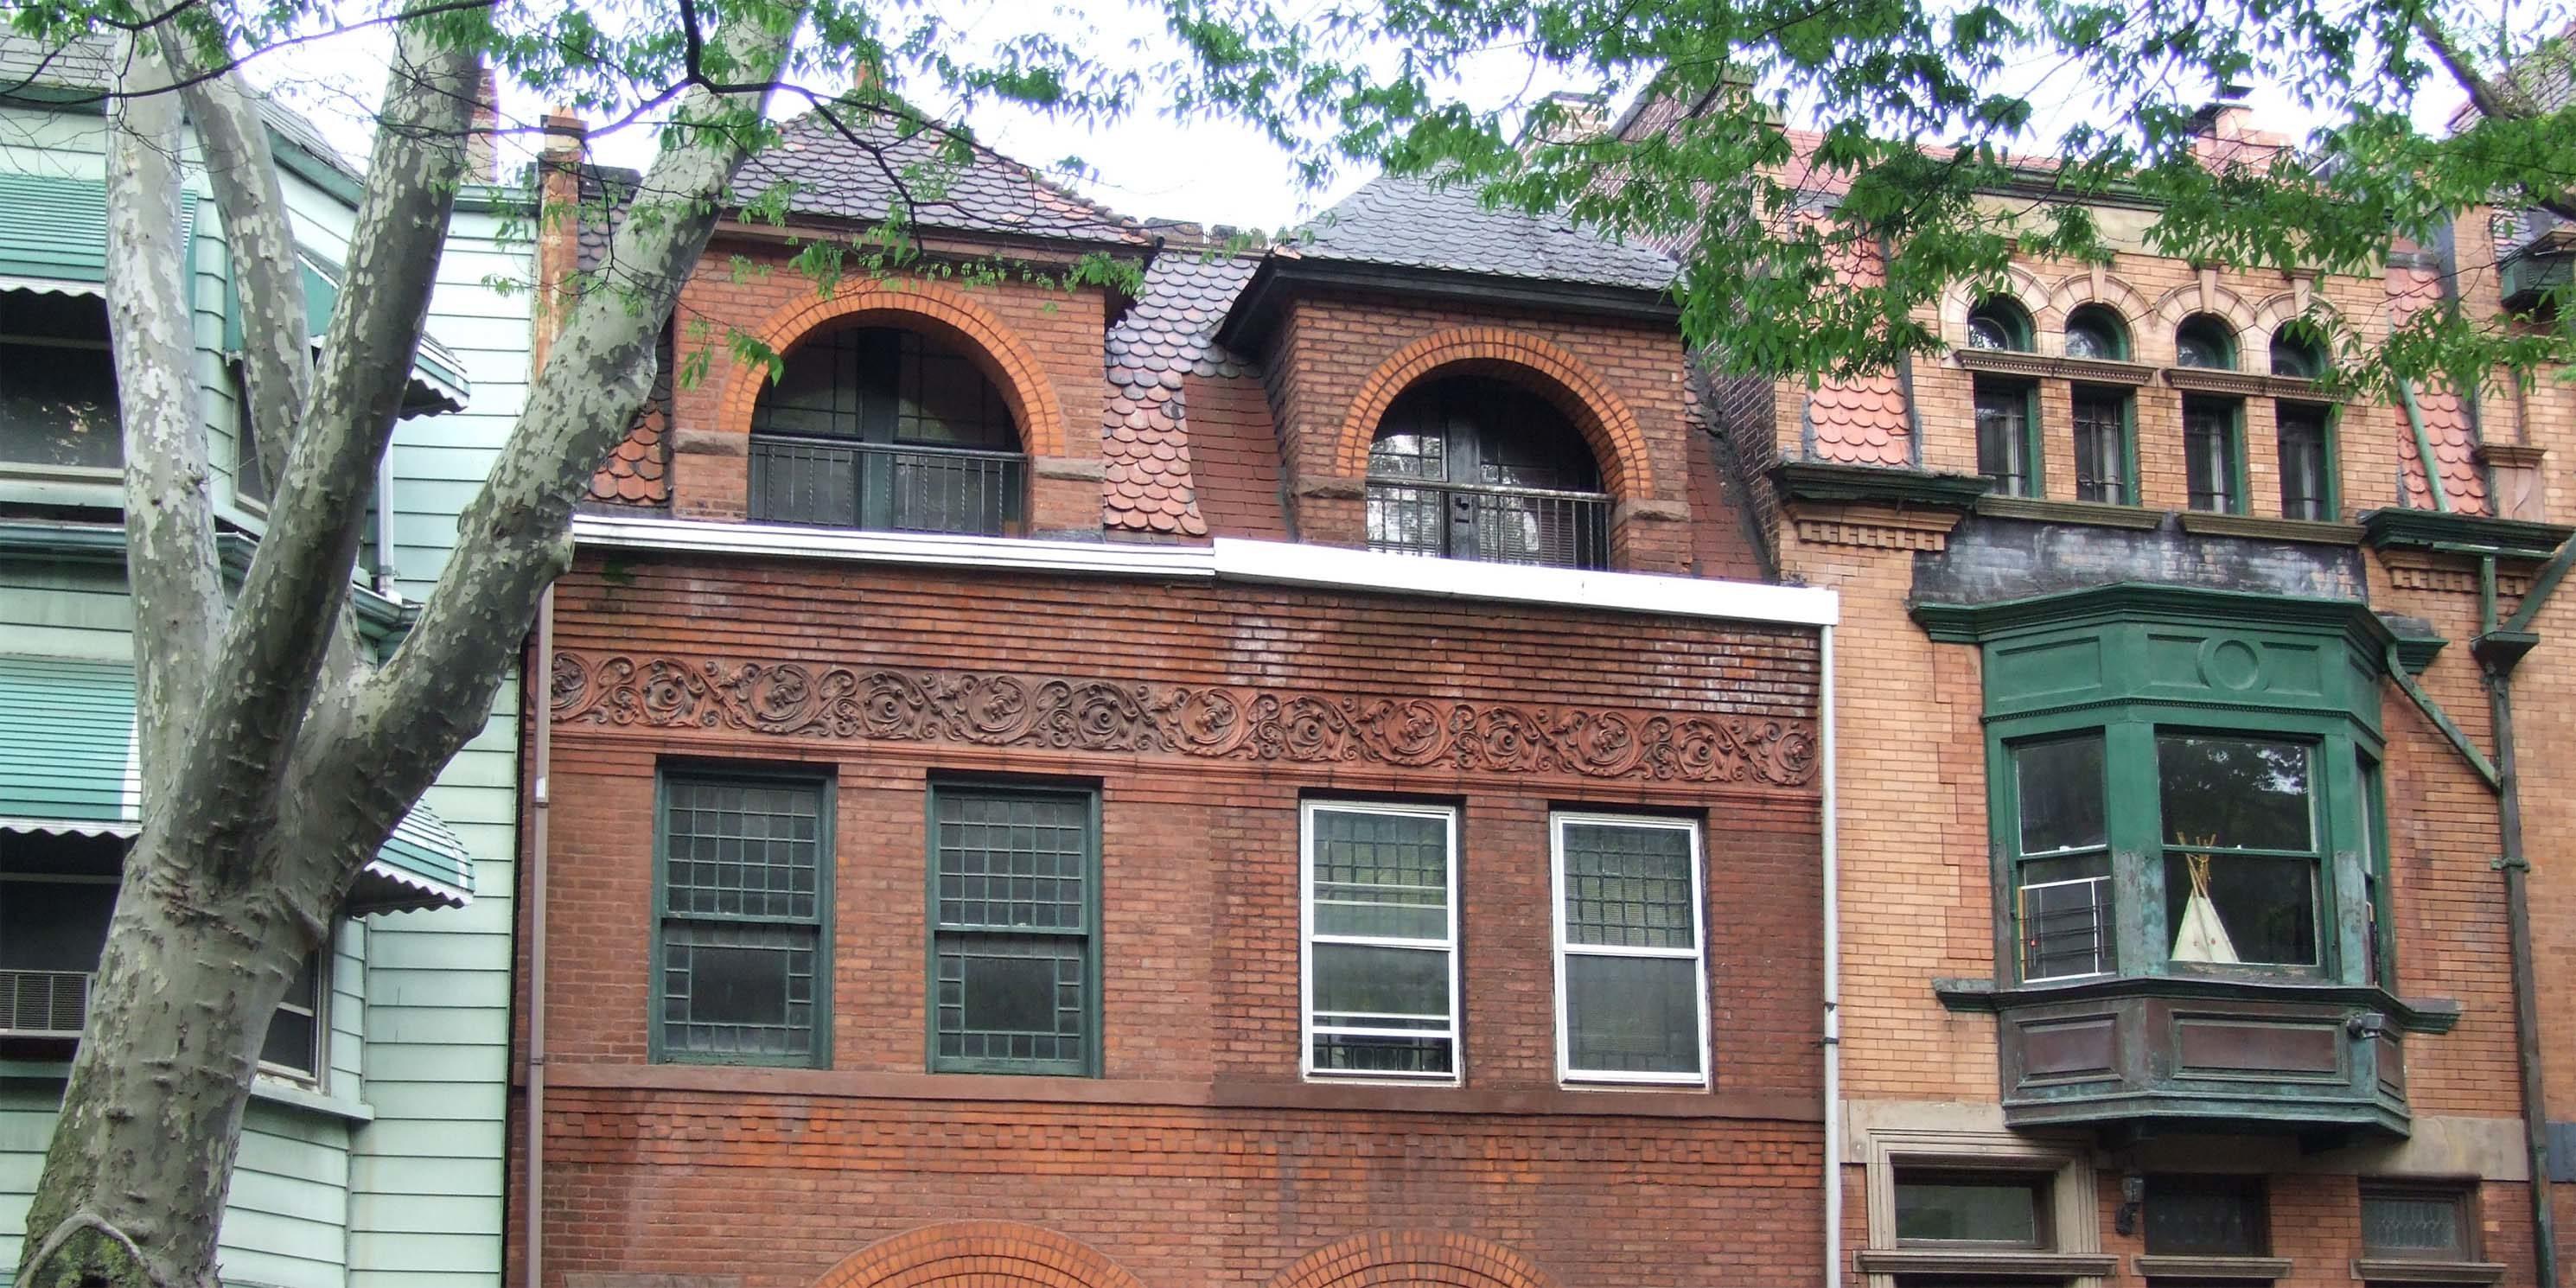 buildings in Saint James Place, Clinton Hill, Brooklyn